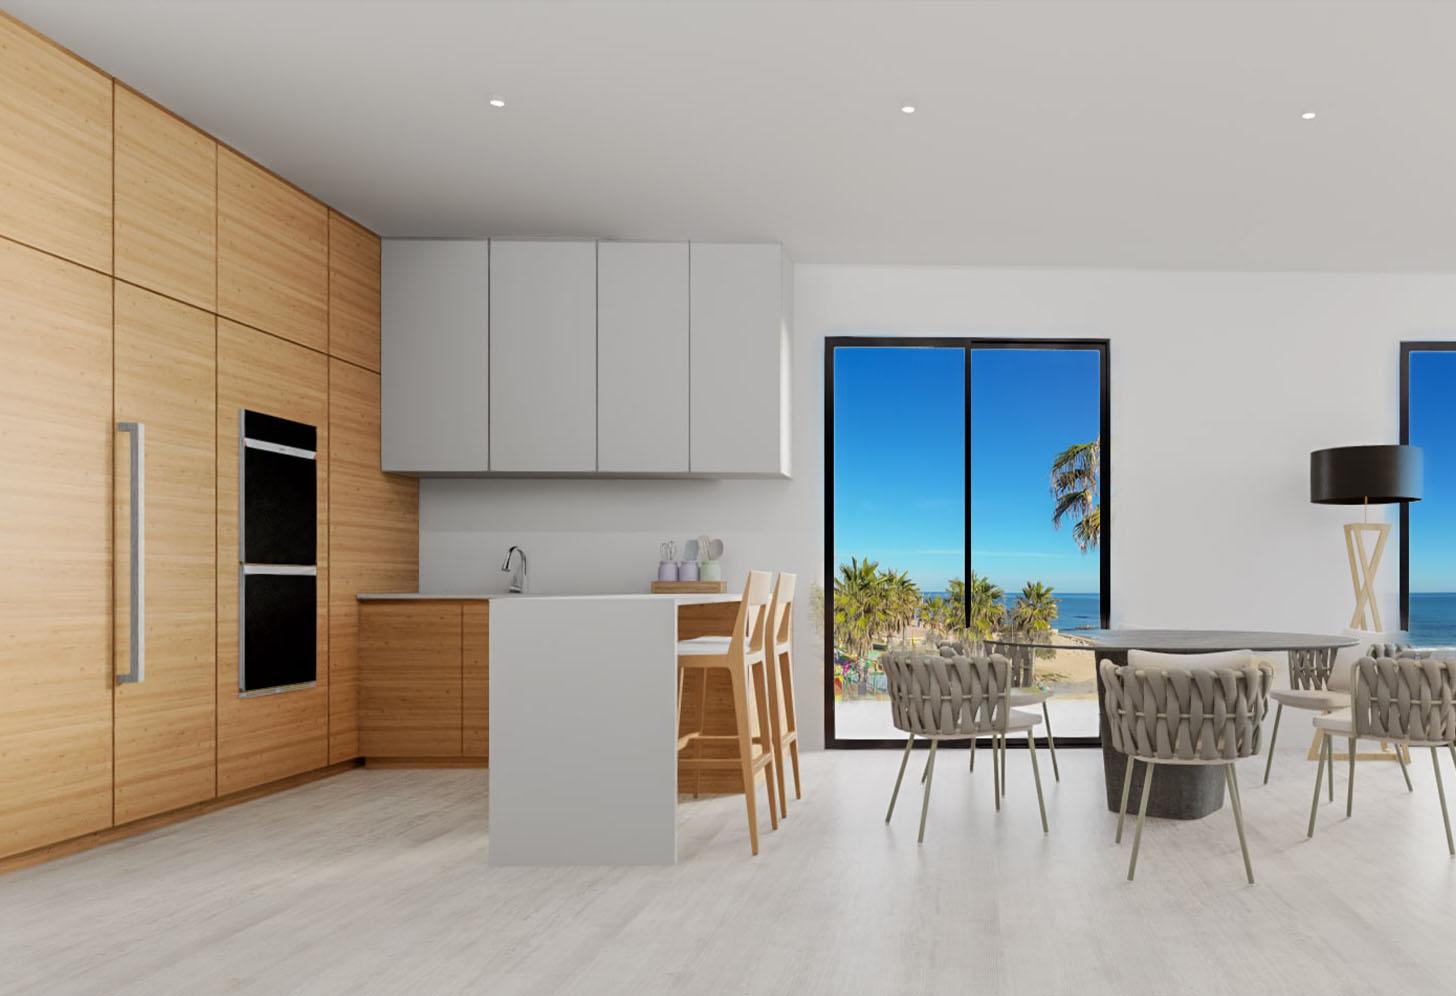 immobilier neuf espagne costa blanca nord on-c6 edificio miramar cuisine